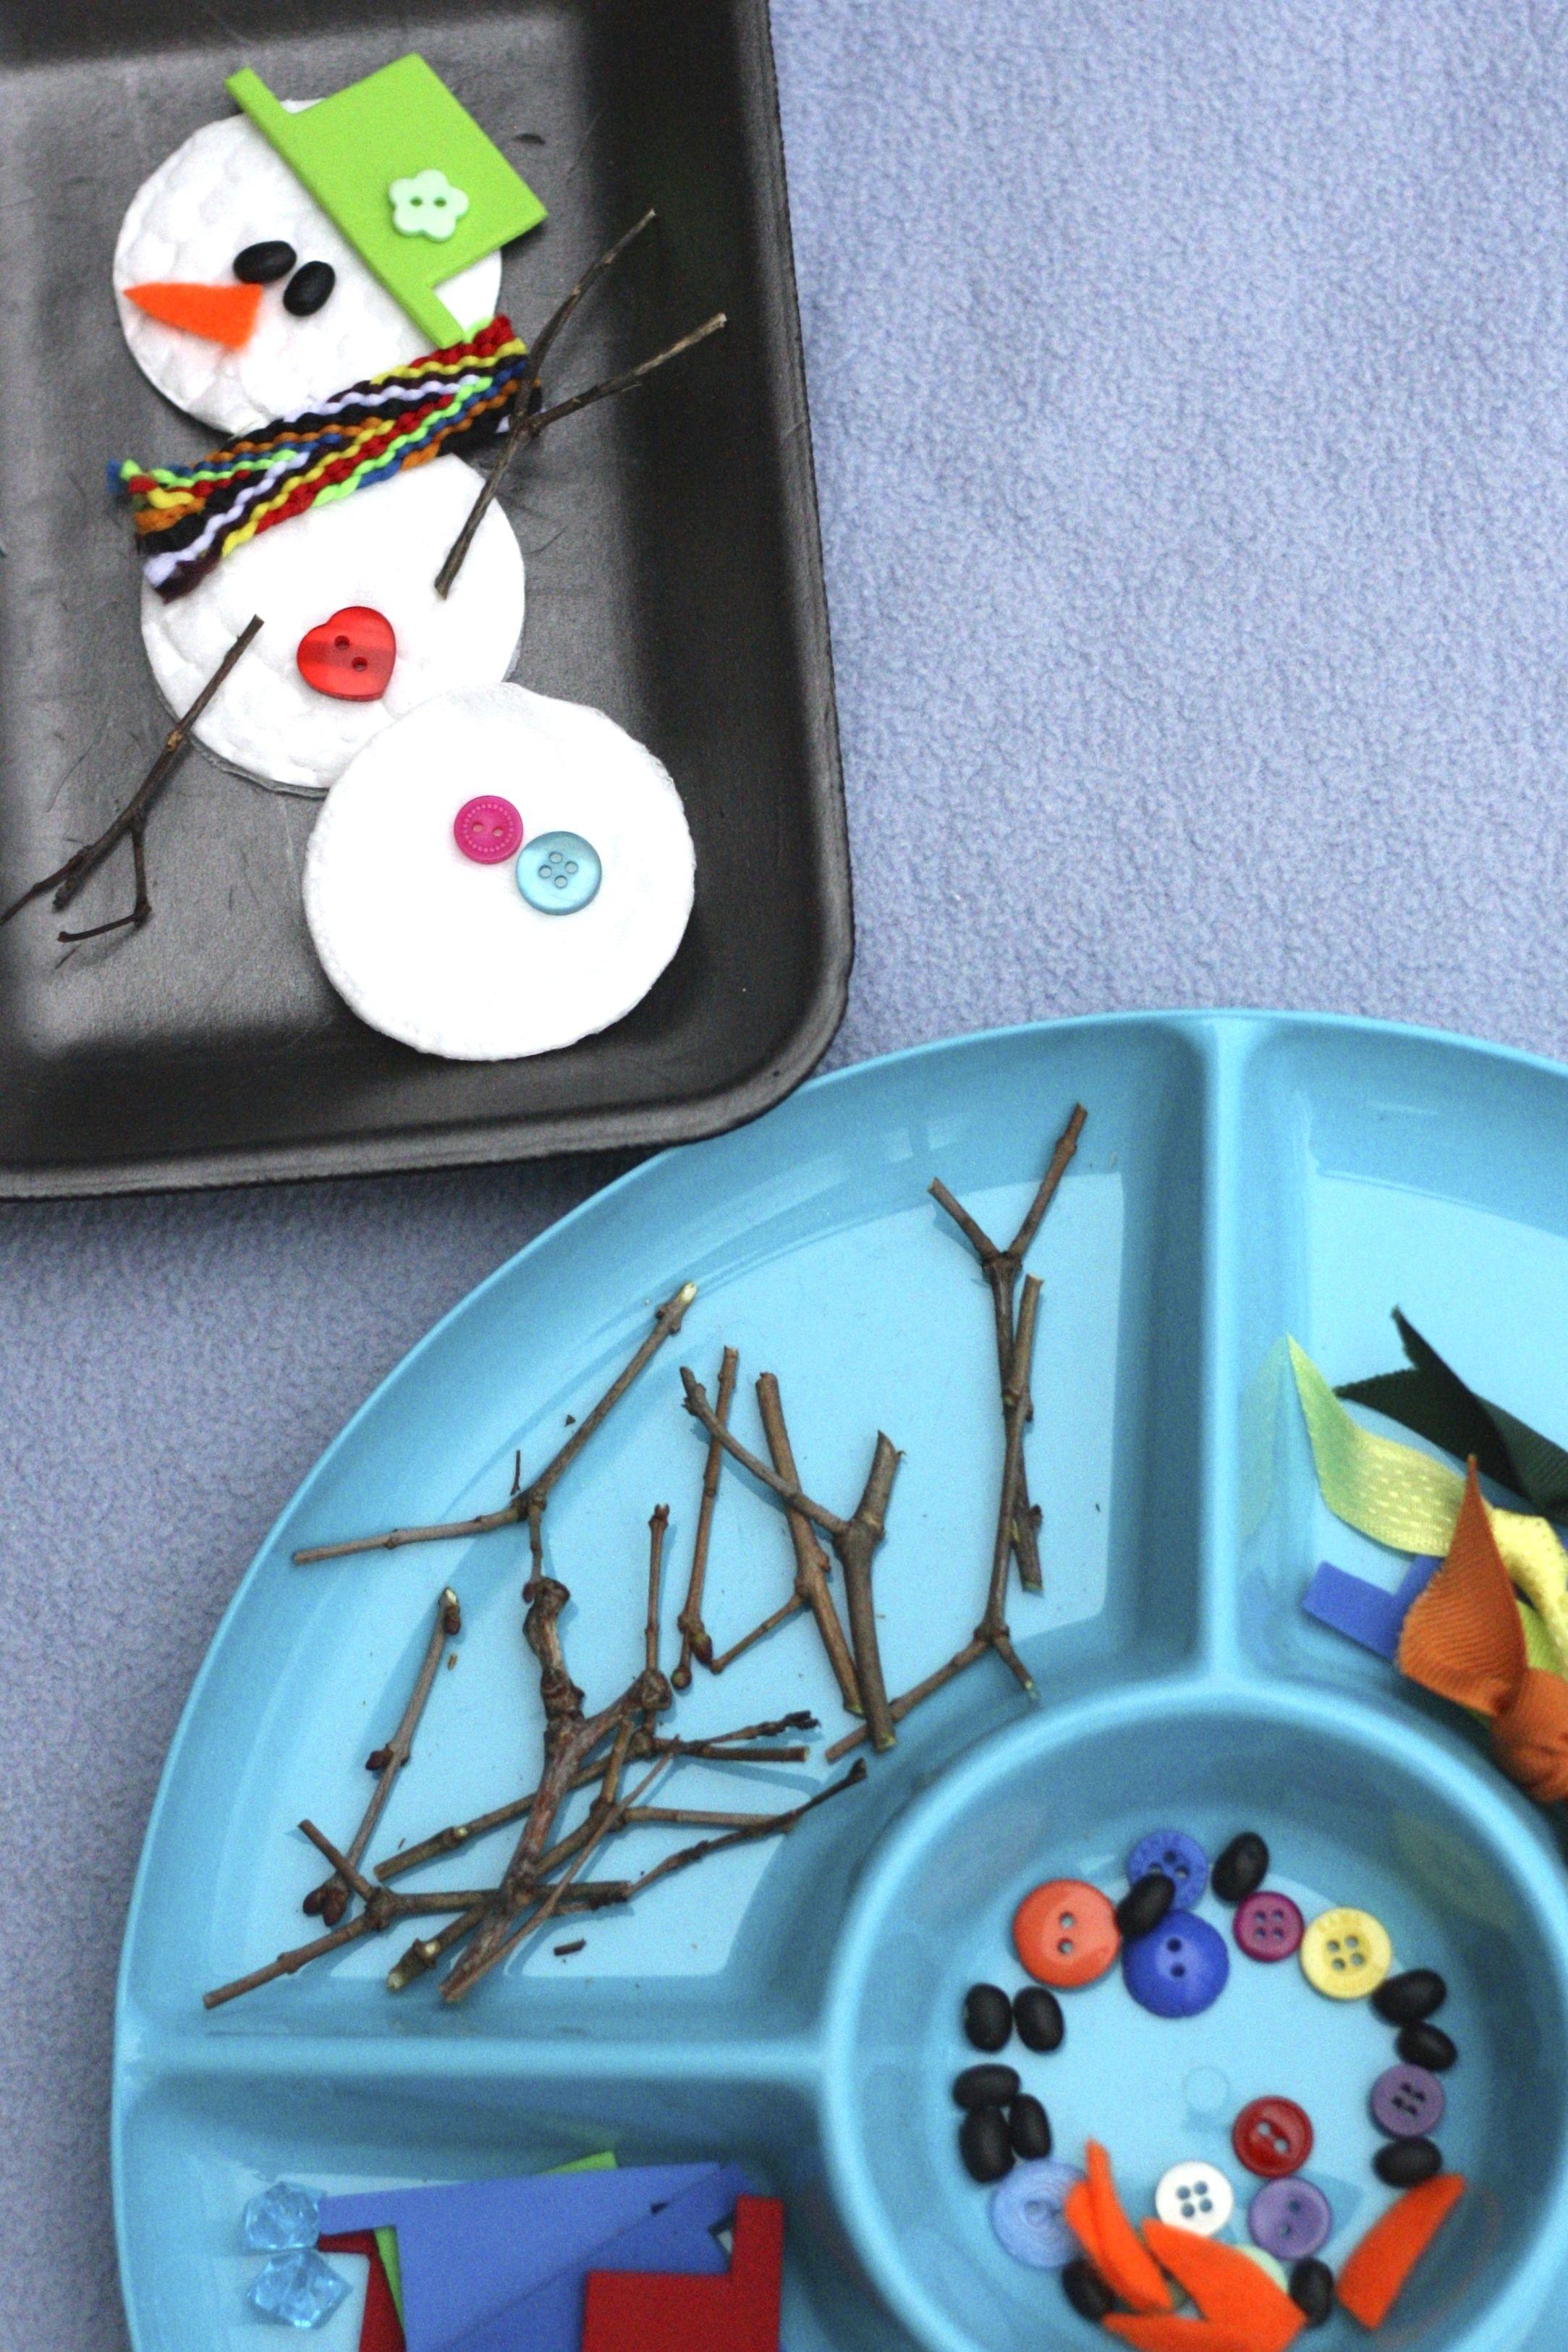 Build A Snowman Activity Tray For Preschoolers